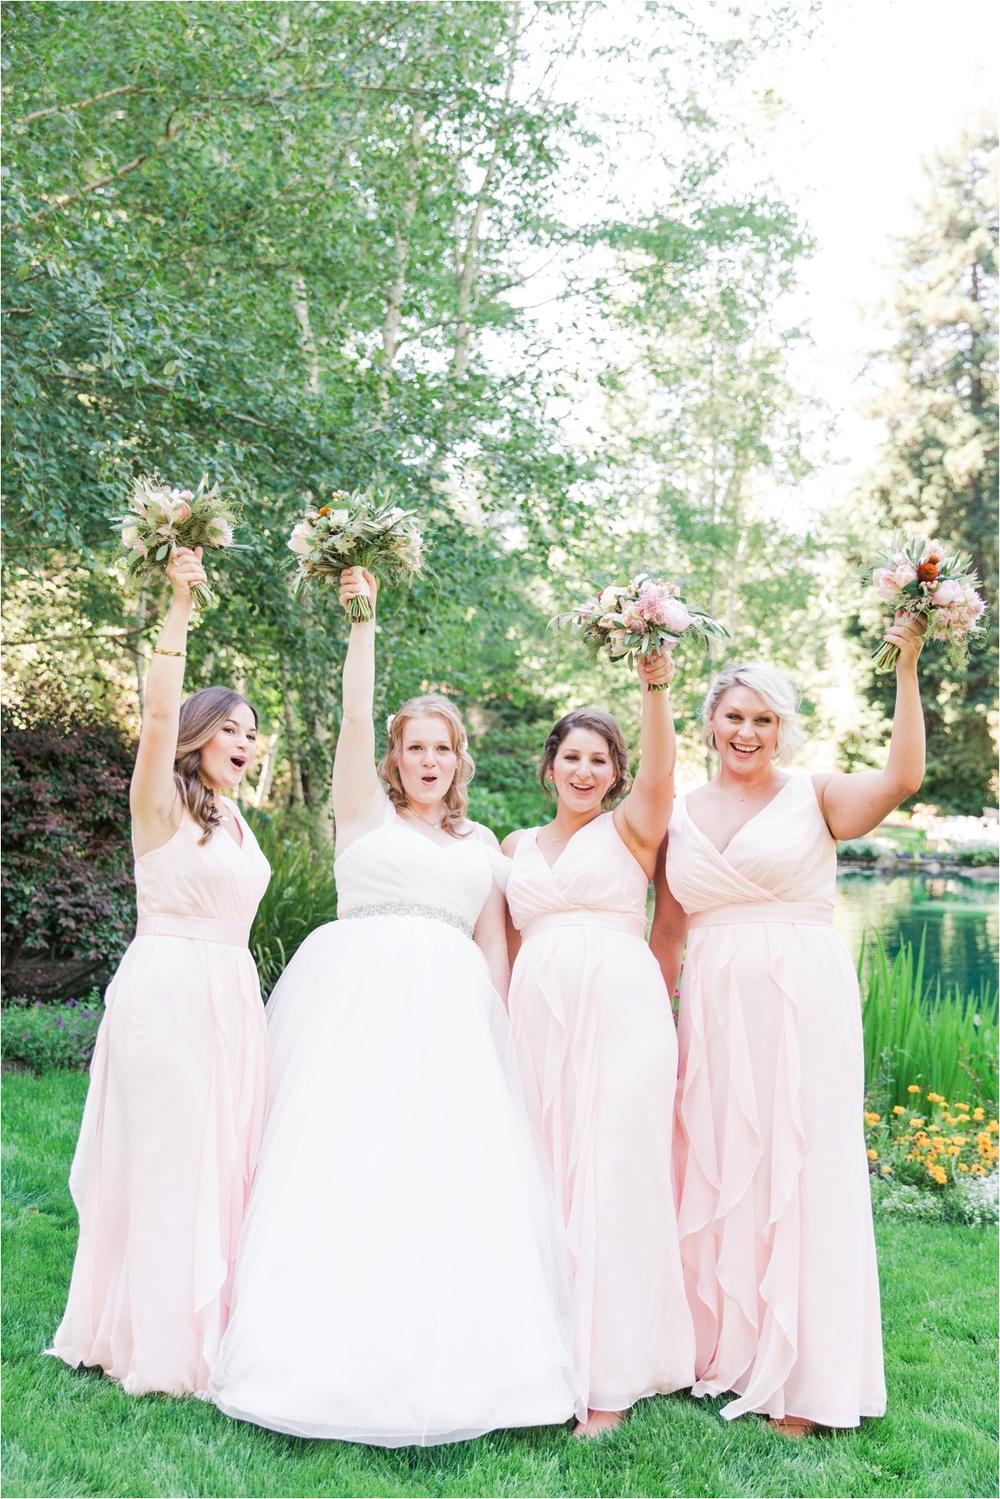 Nestldown wedding Photos by Briana Calderon Photography_0170.jpg